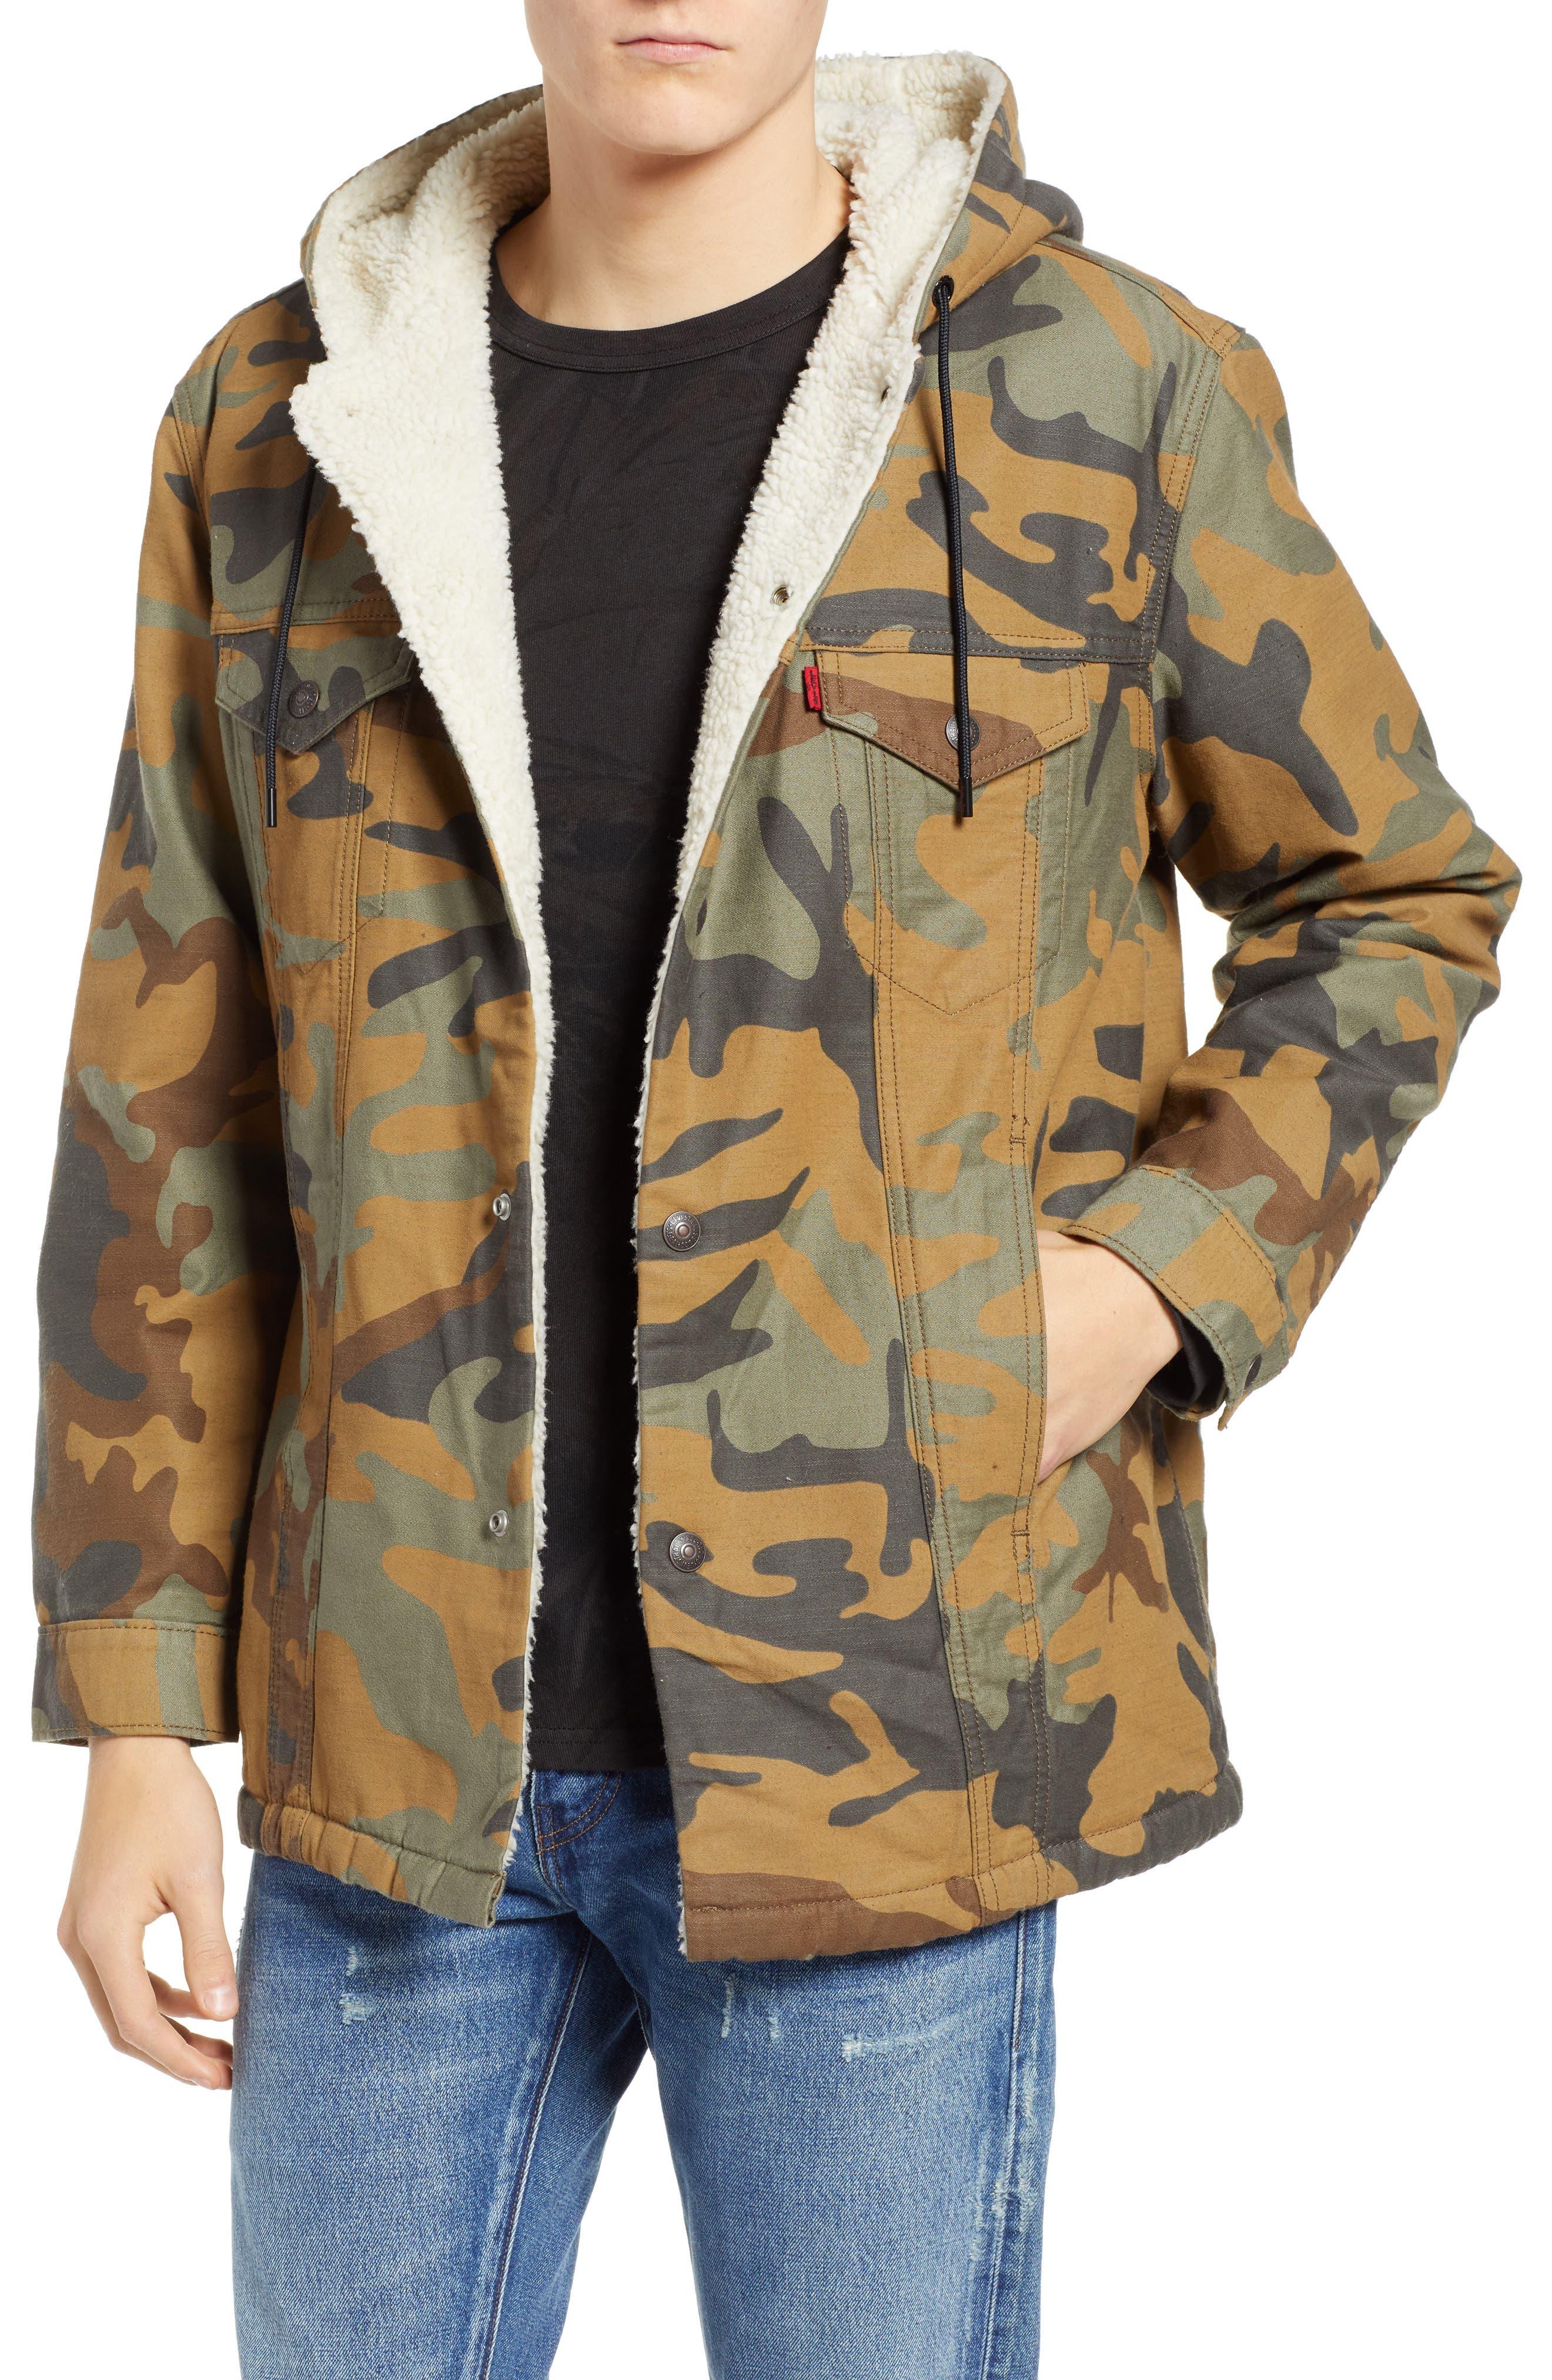 x Justin Timberlake Faux Shearling Hooded Trucker Jacket,                             Main thumbnail 1, color,                             001